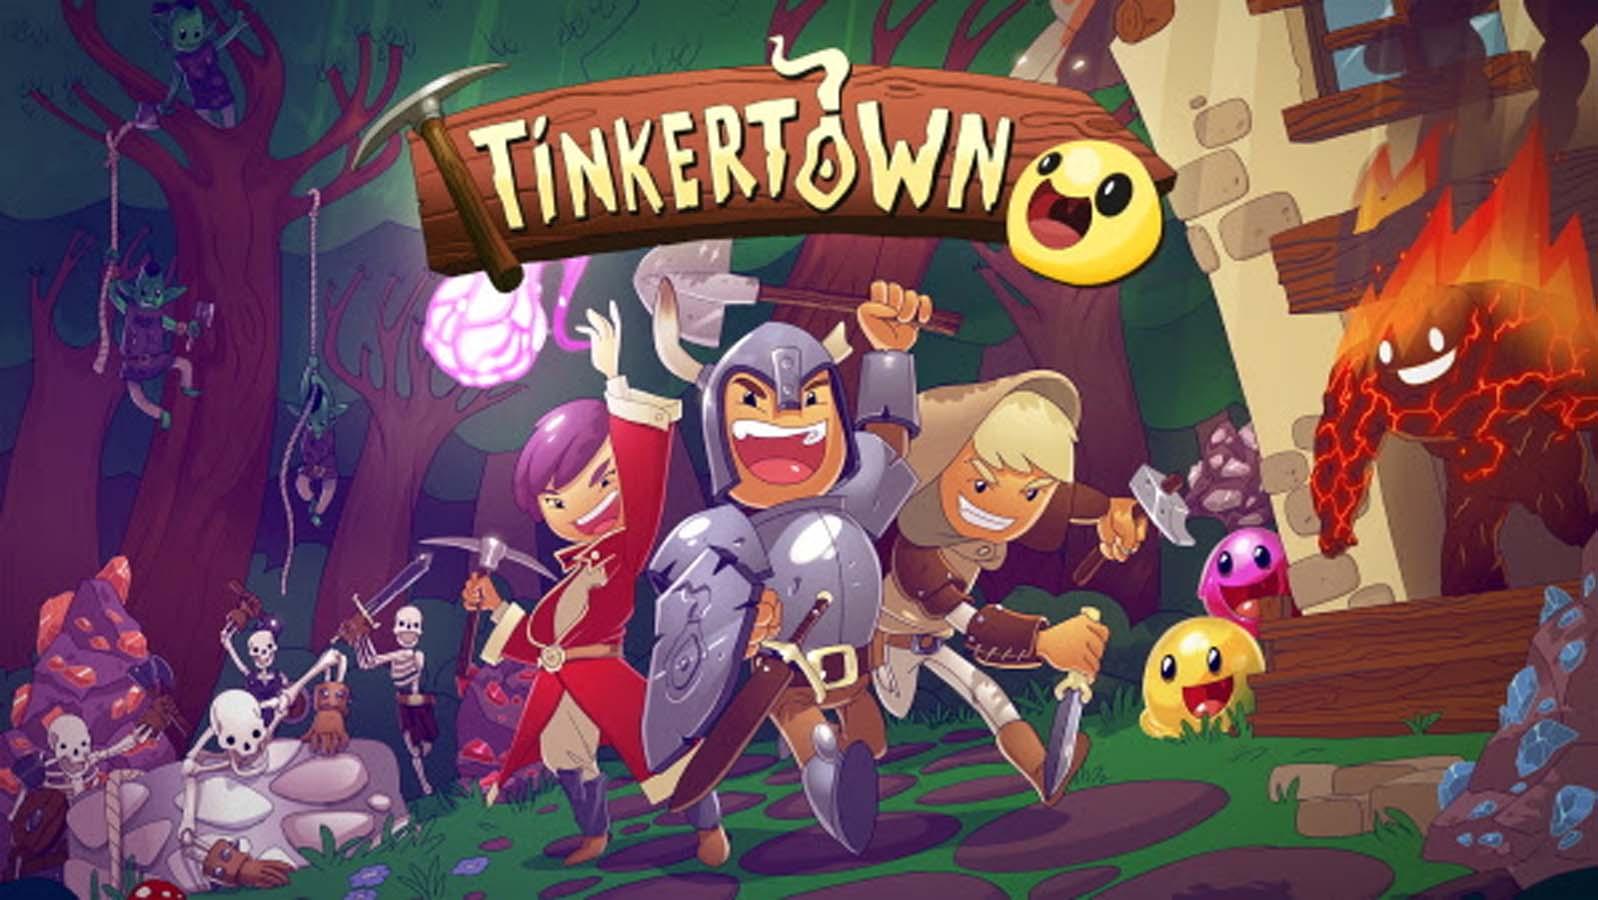 Tinkertown, Headup's Cheerful 16-bit Sandbox Adventure RPG, Arrives on Steam Today